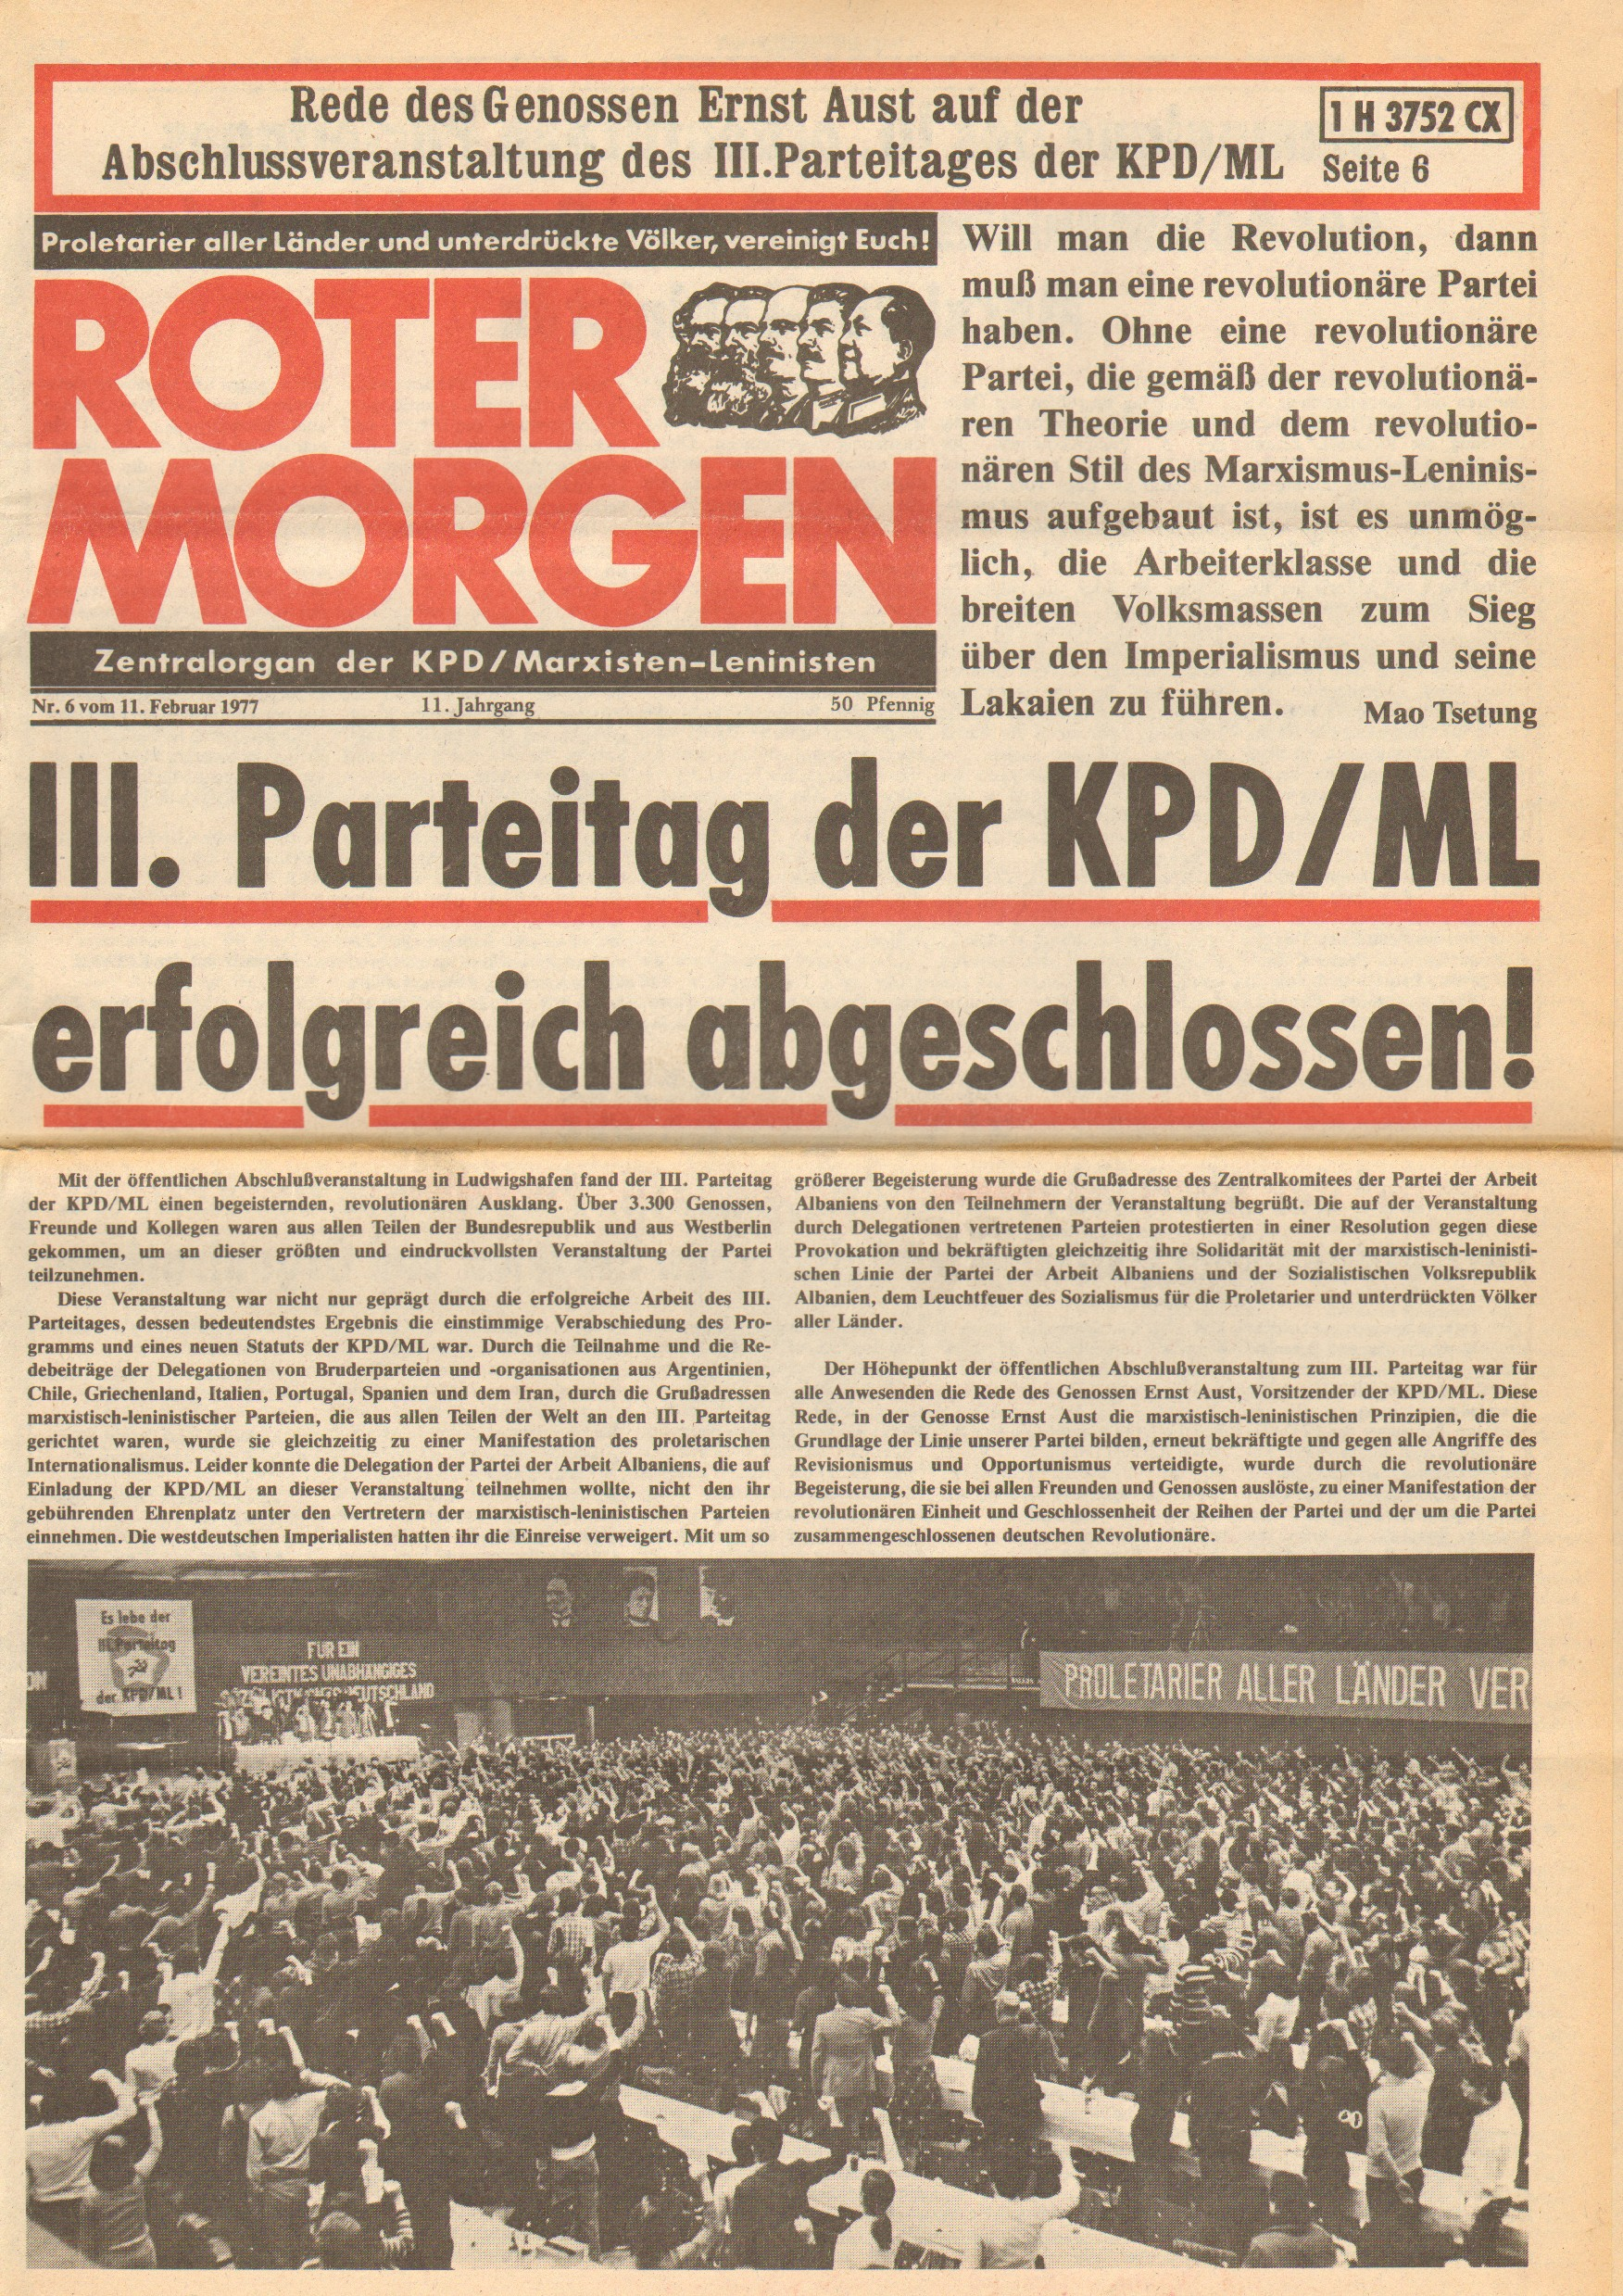 Roter Morgen, 11. Jg., 11. Februar 1977, Nr. 6, Seite 1